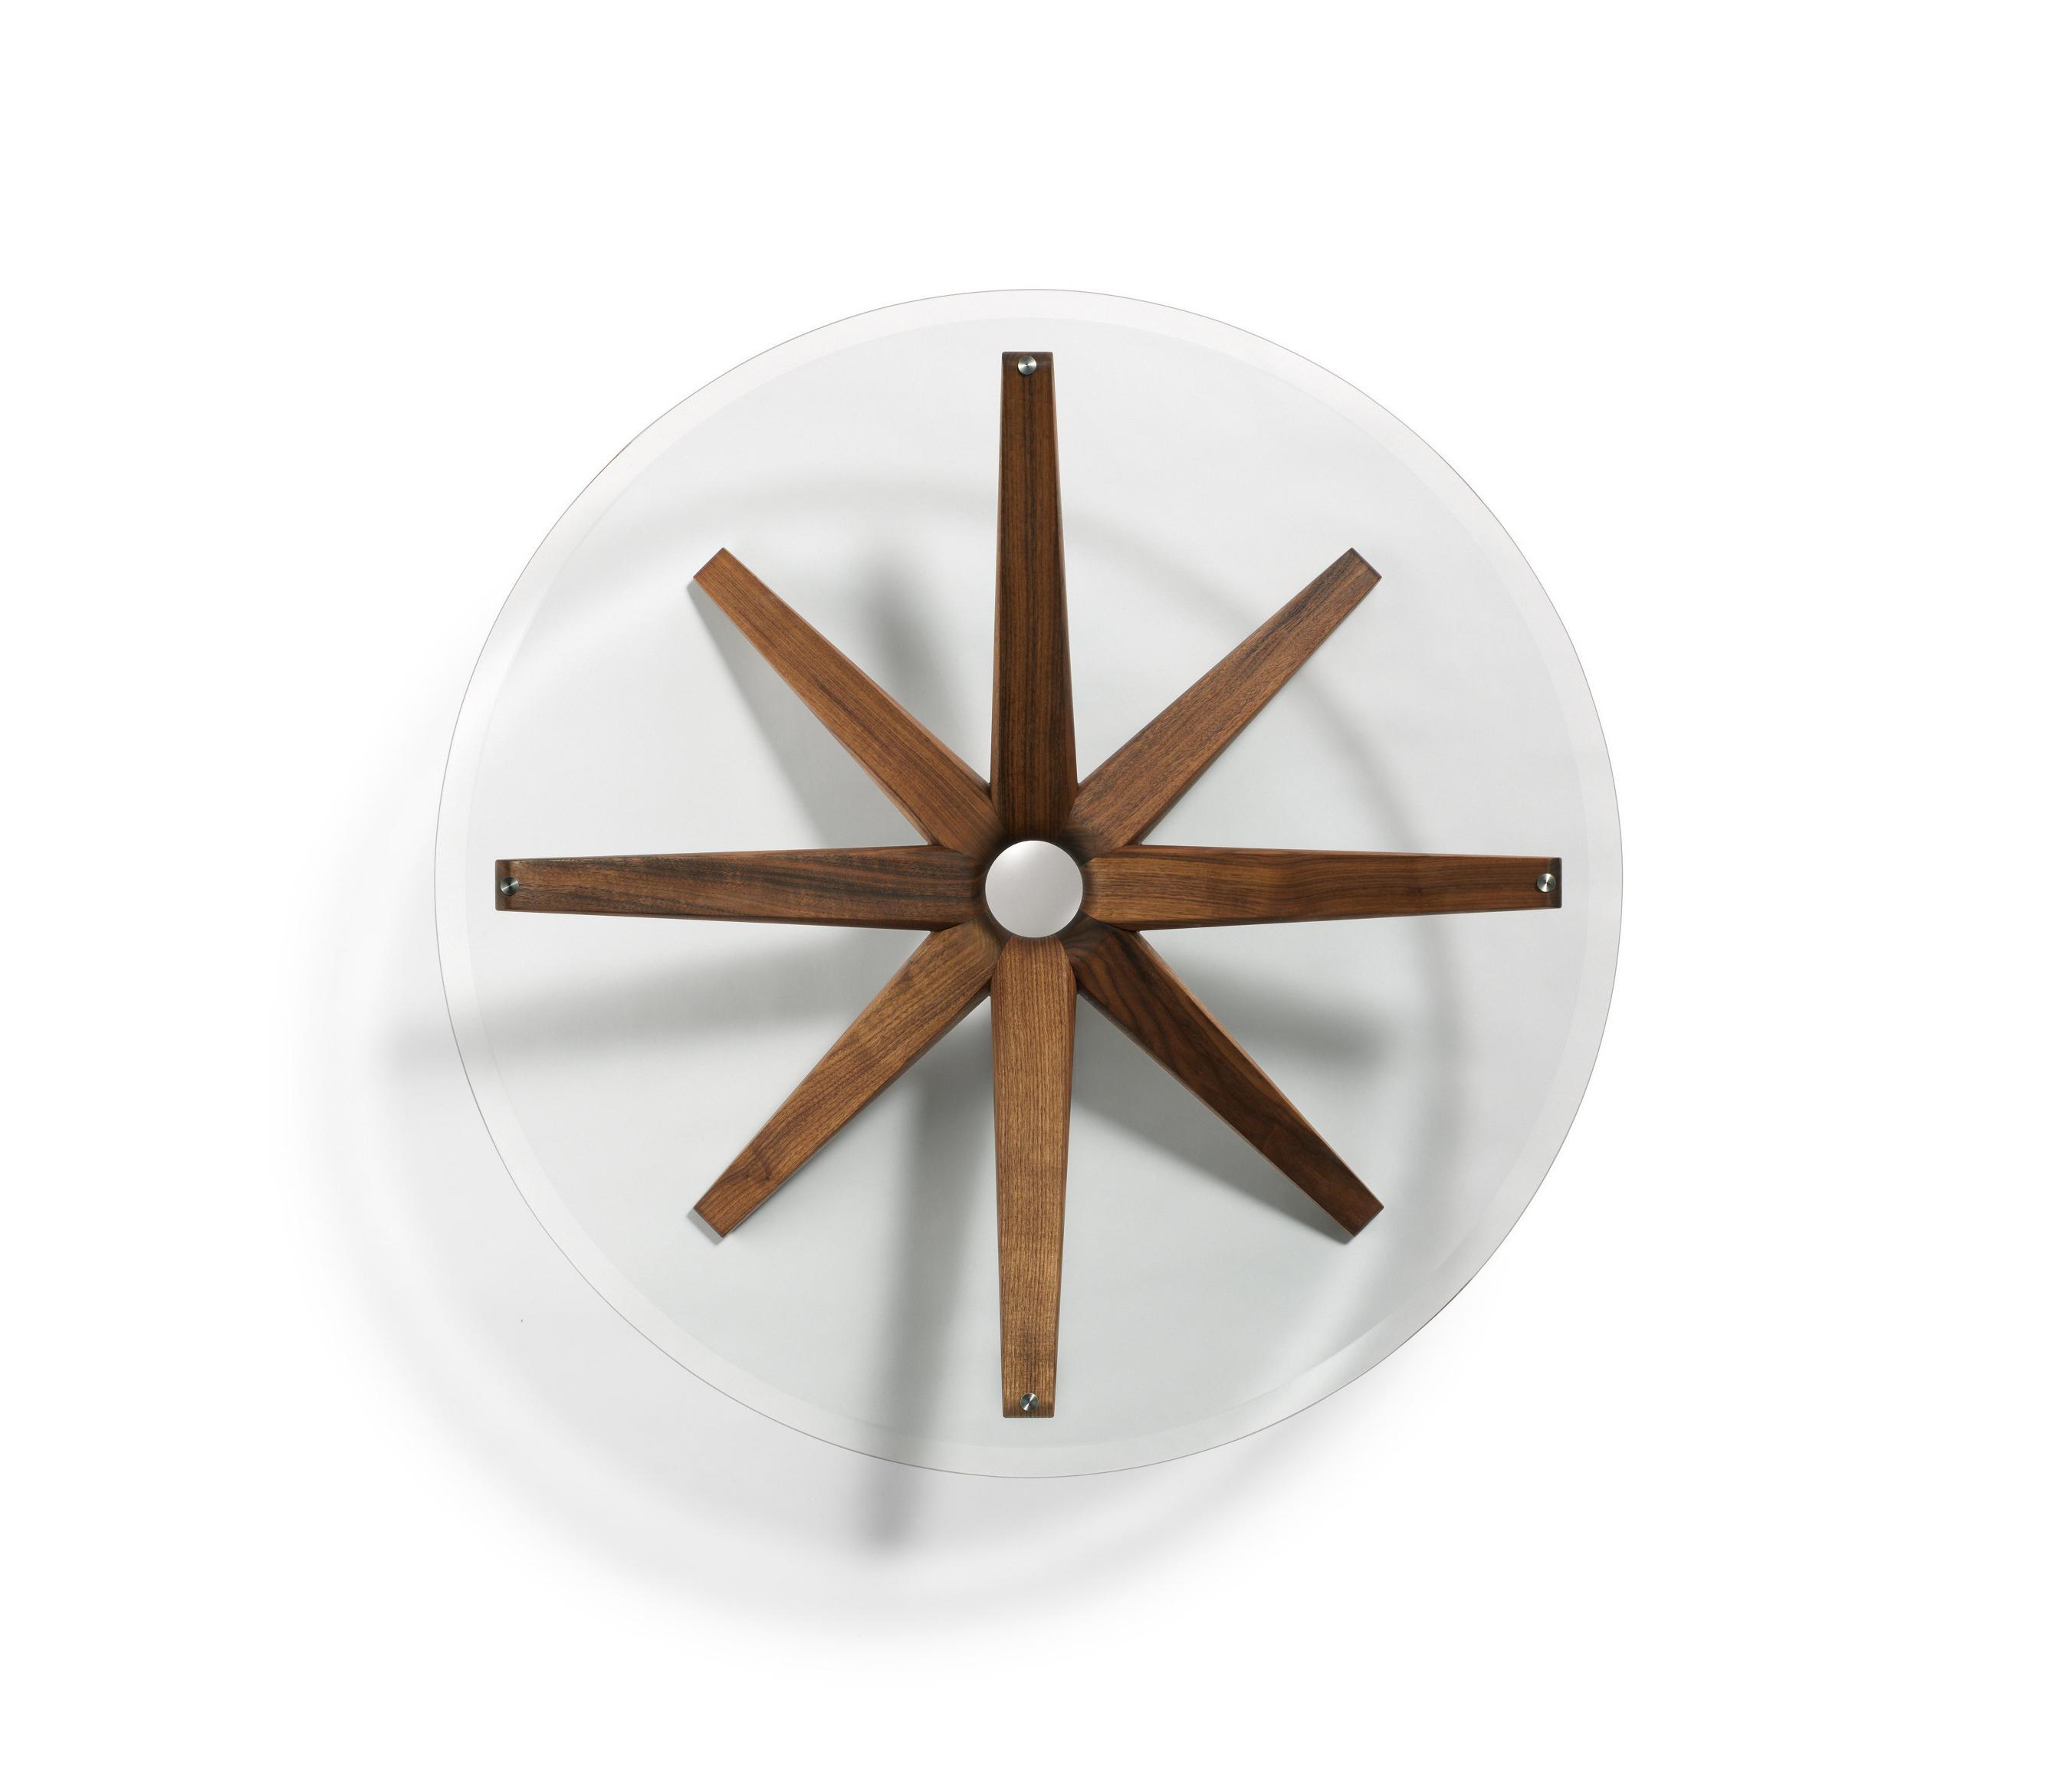 Stern Coffee Table Designer Furniture Architonic